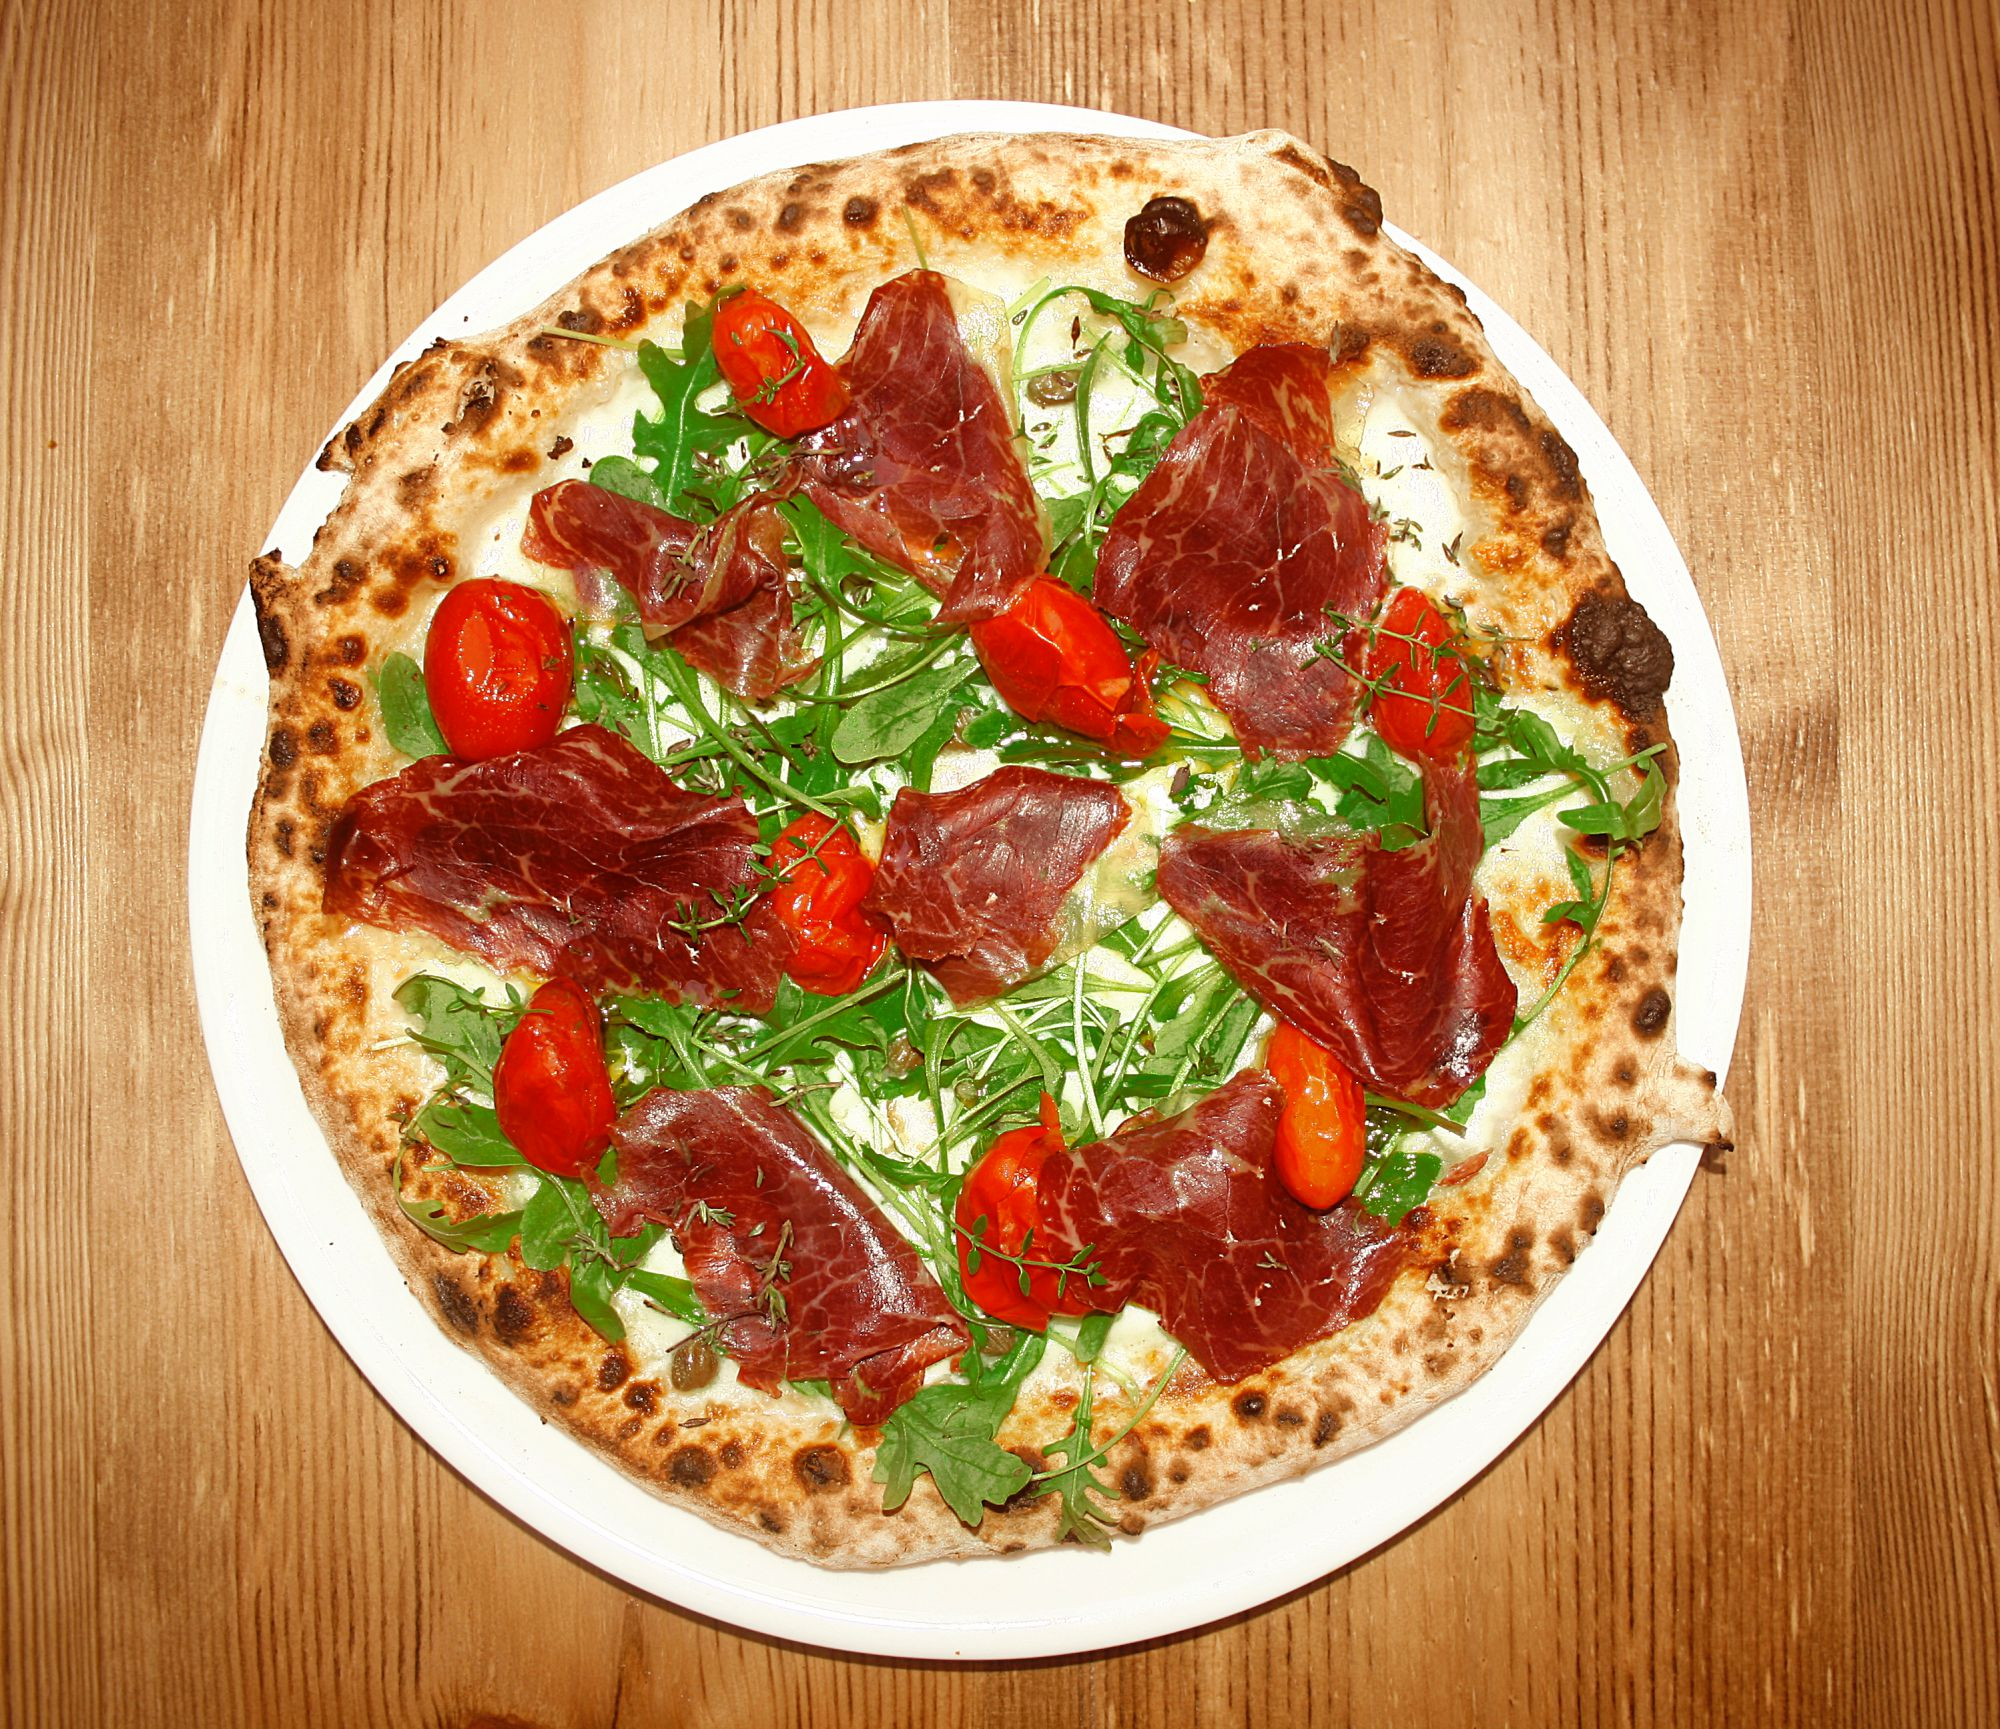 Pizza de cecina, 'mozzarella', rúcula, alcaparras y tomatito confitado de 'Garden Pizza'. Foto: Garden Pizza.